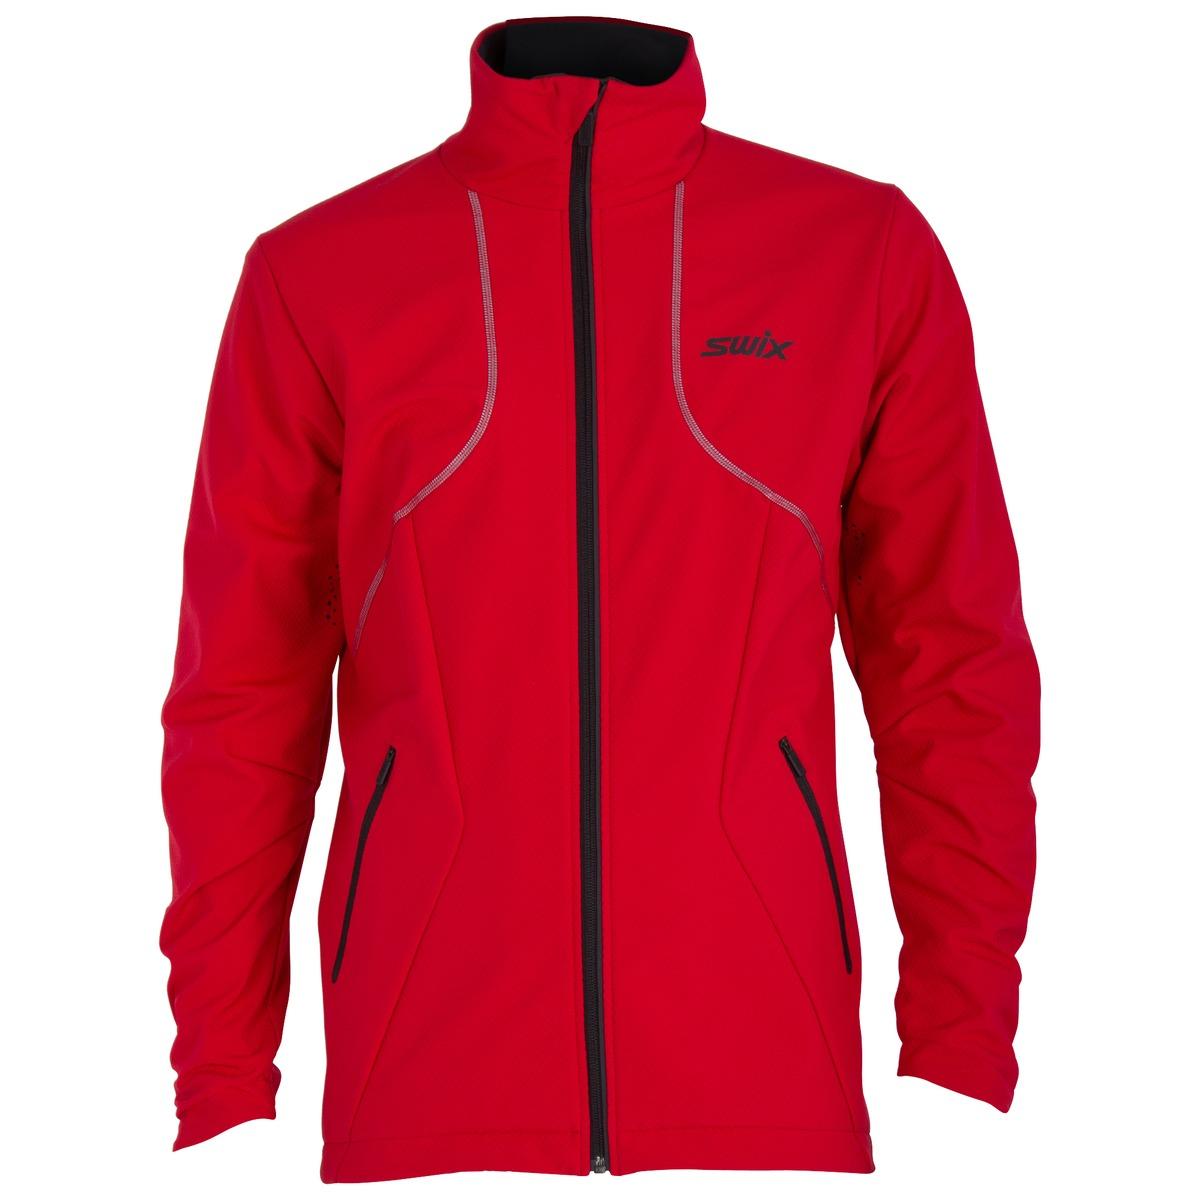 41d26c60 Find swix revolution jakke herre jakker langrennsklær. Shop every ...